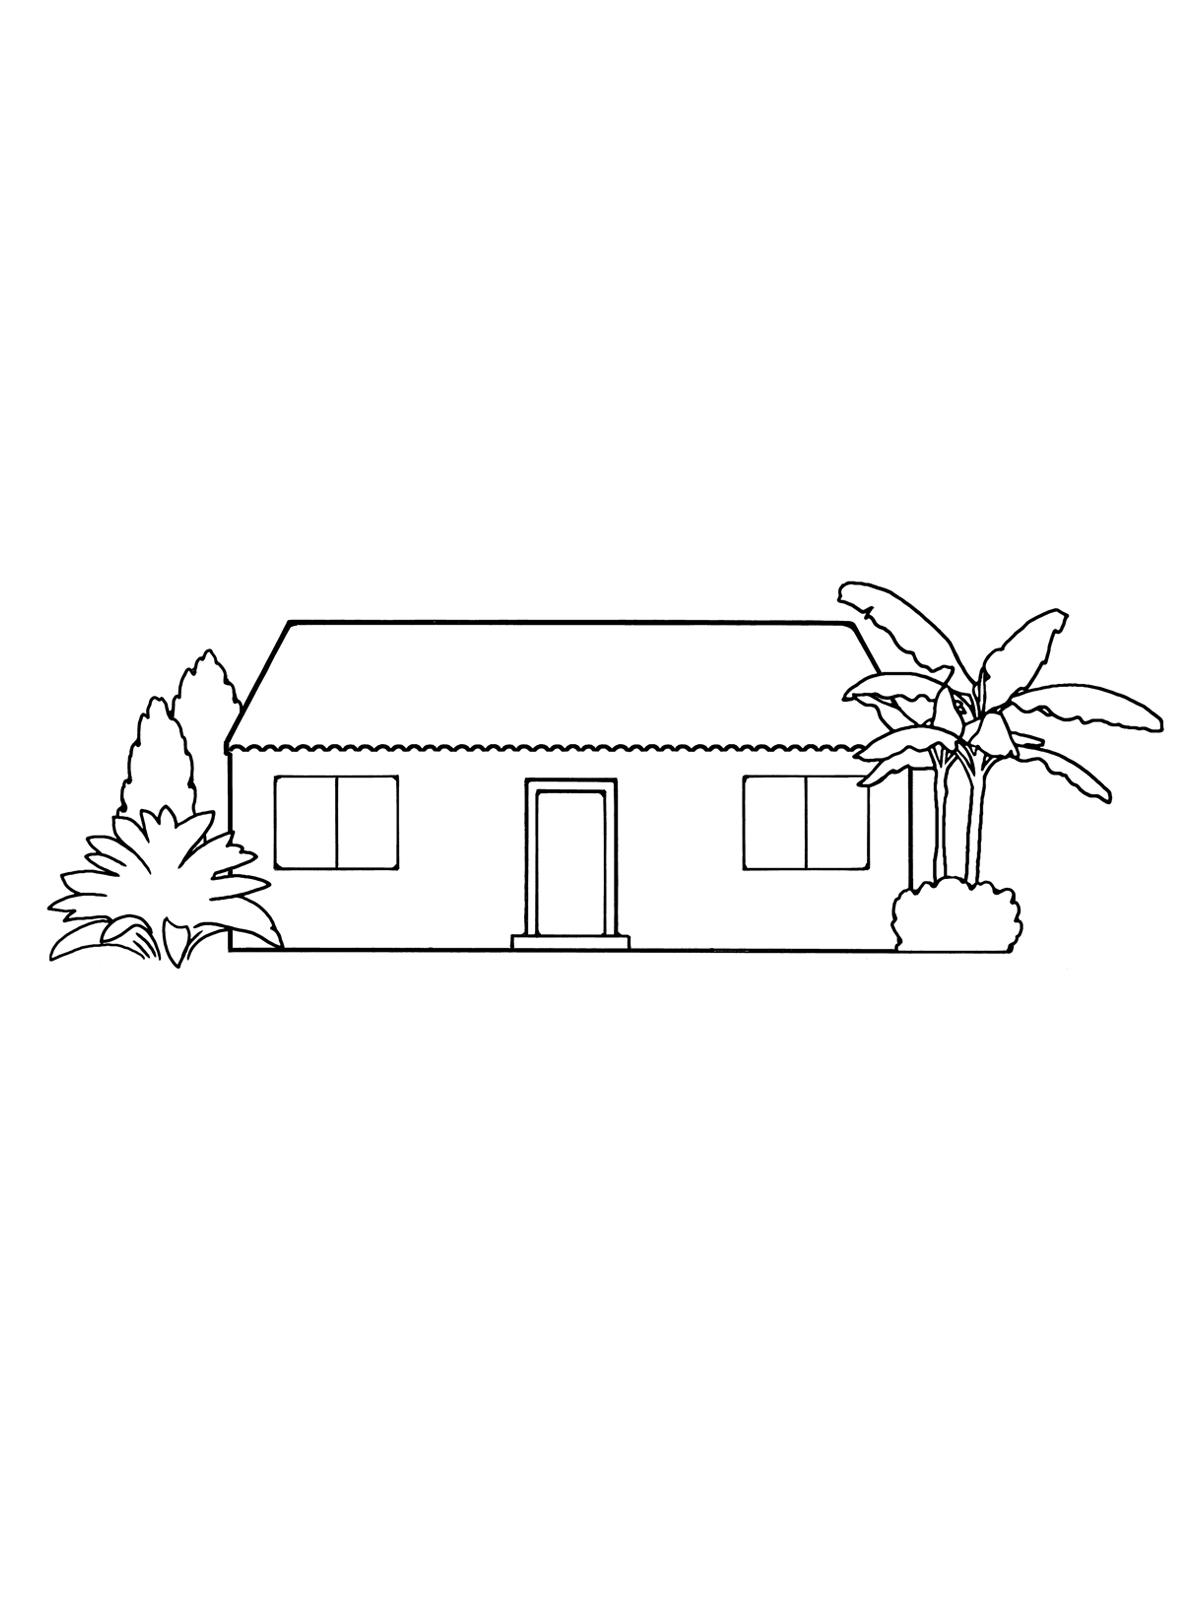 Line Art Home : Home lds